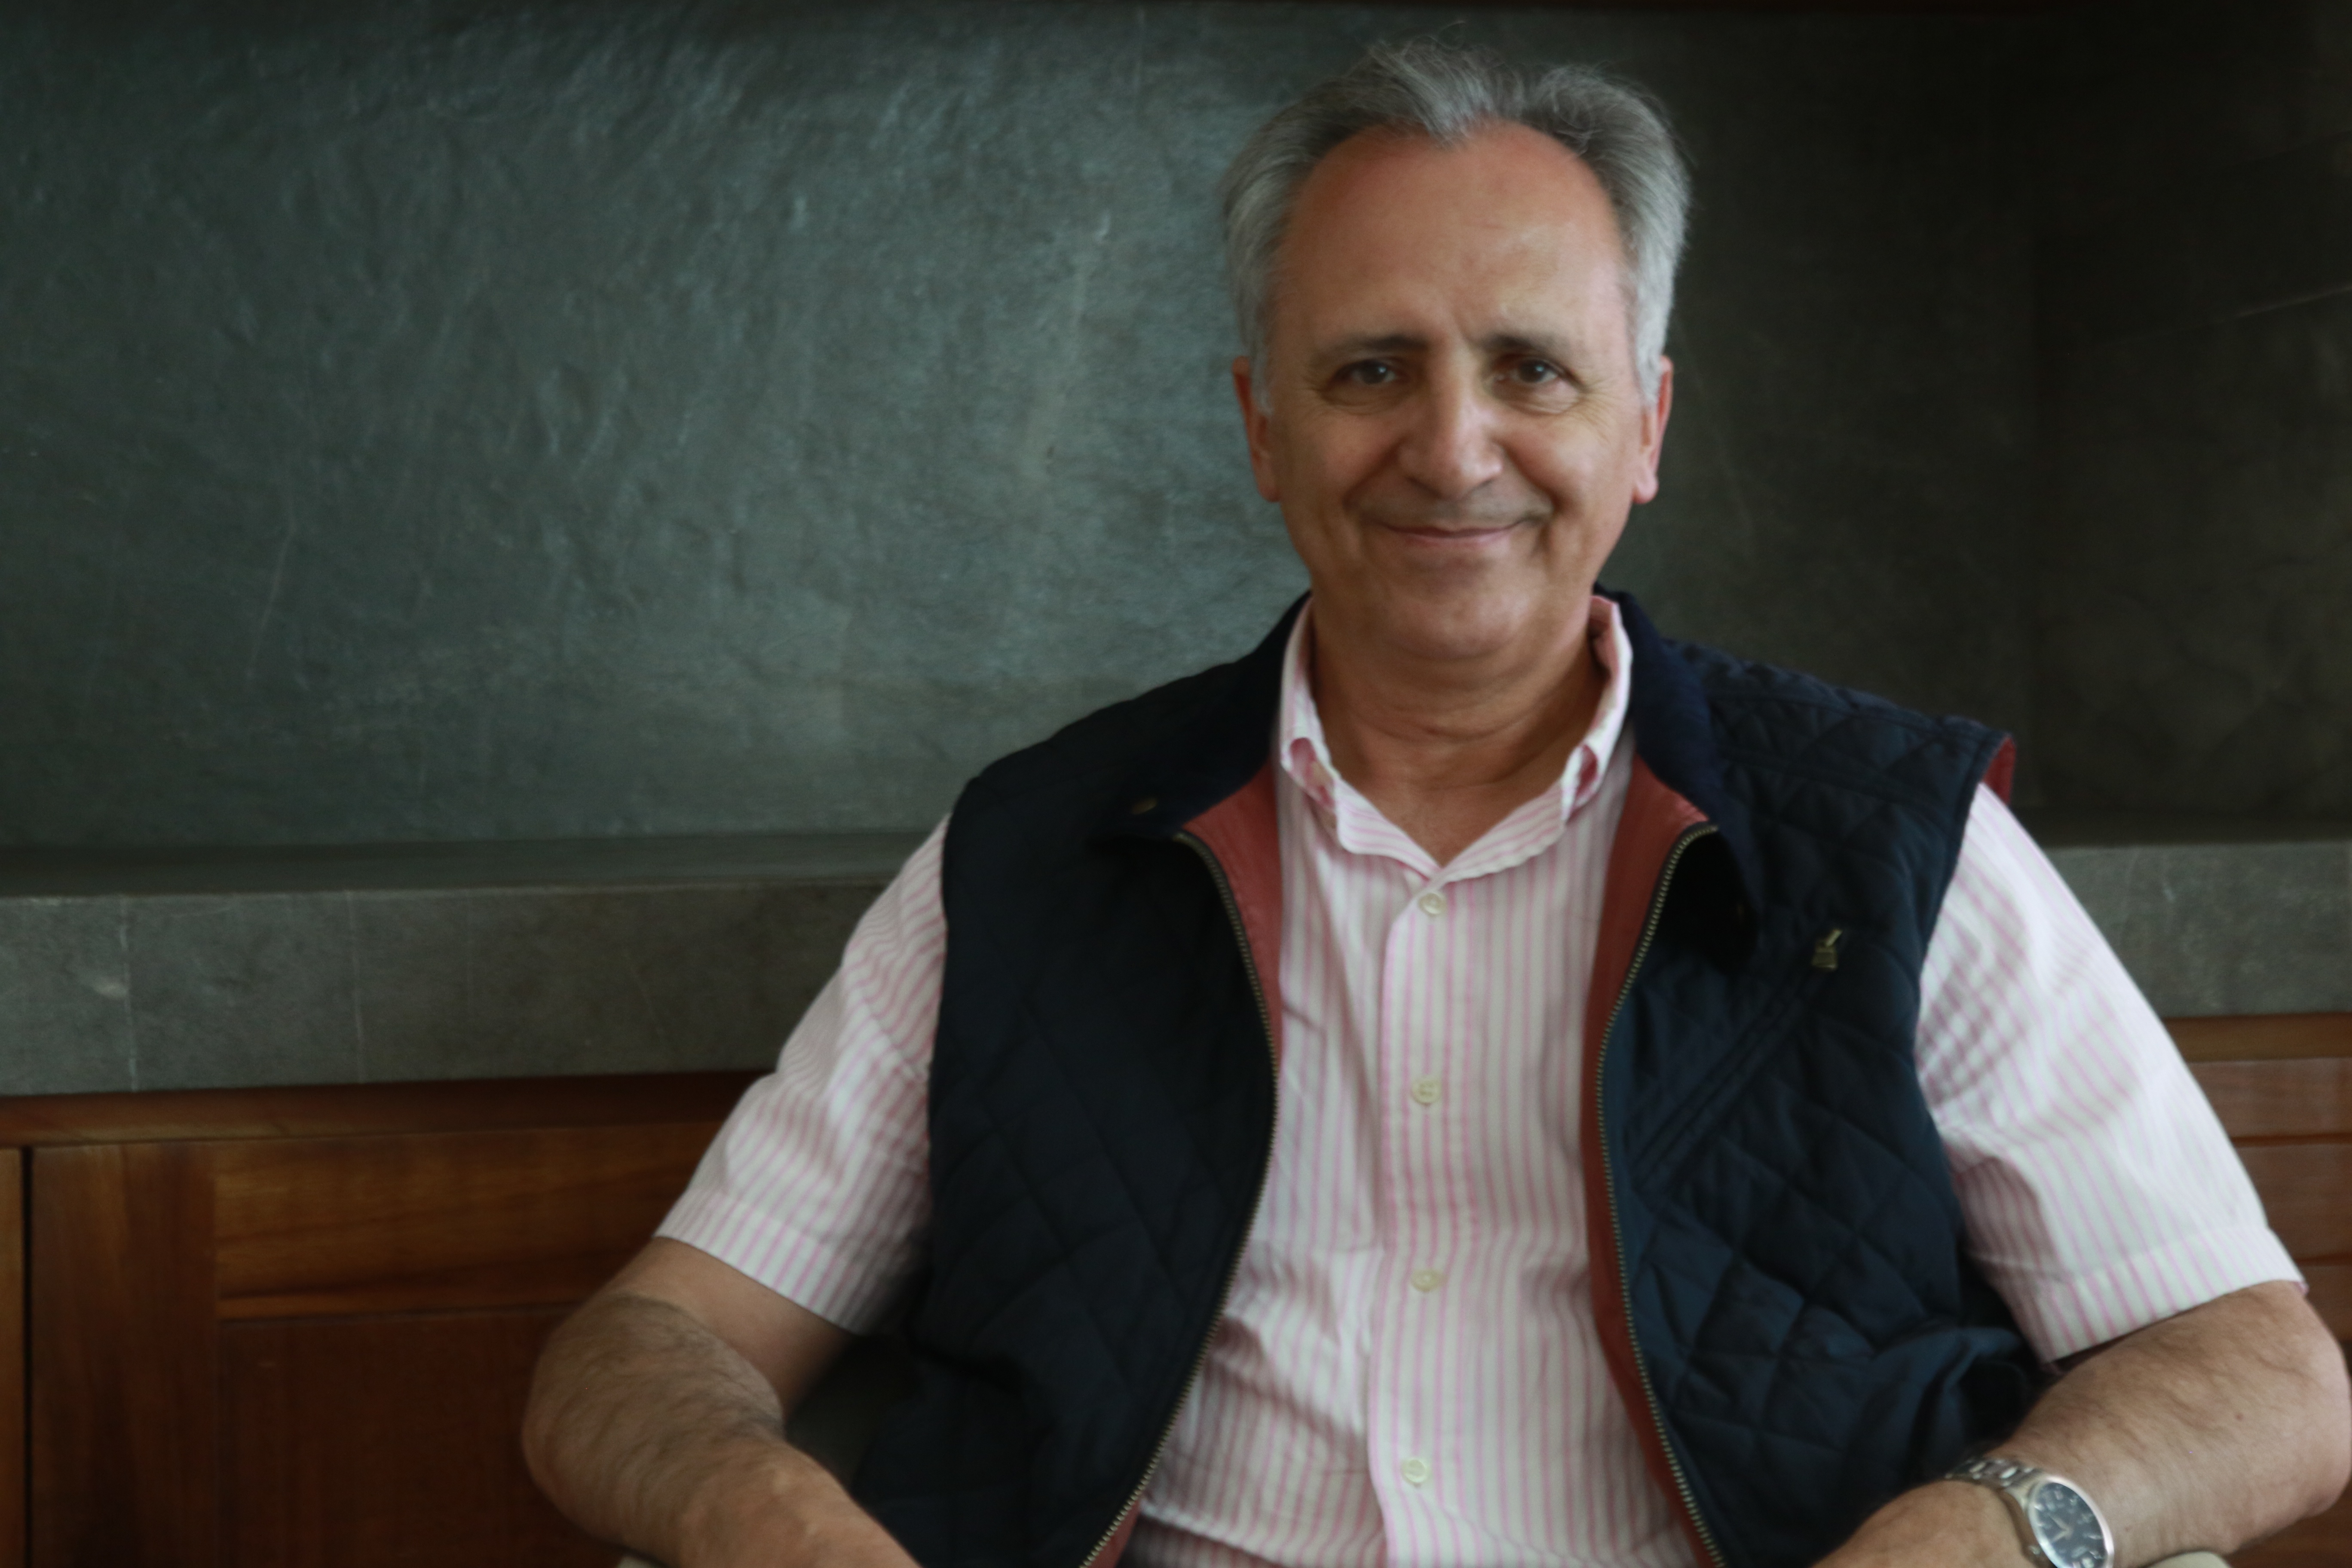 Abel Camarena Arias, Electrical Contractor